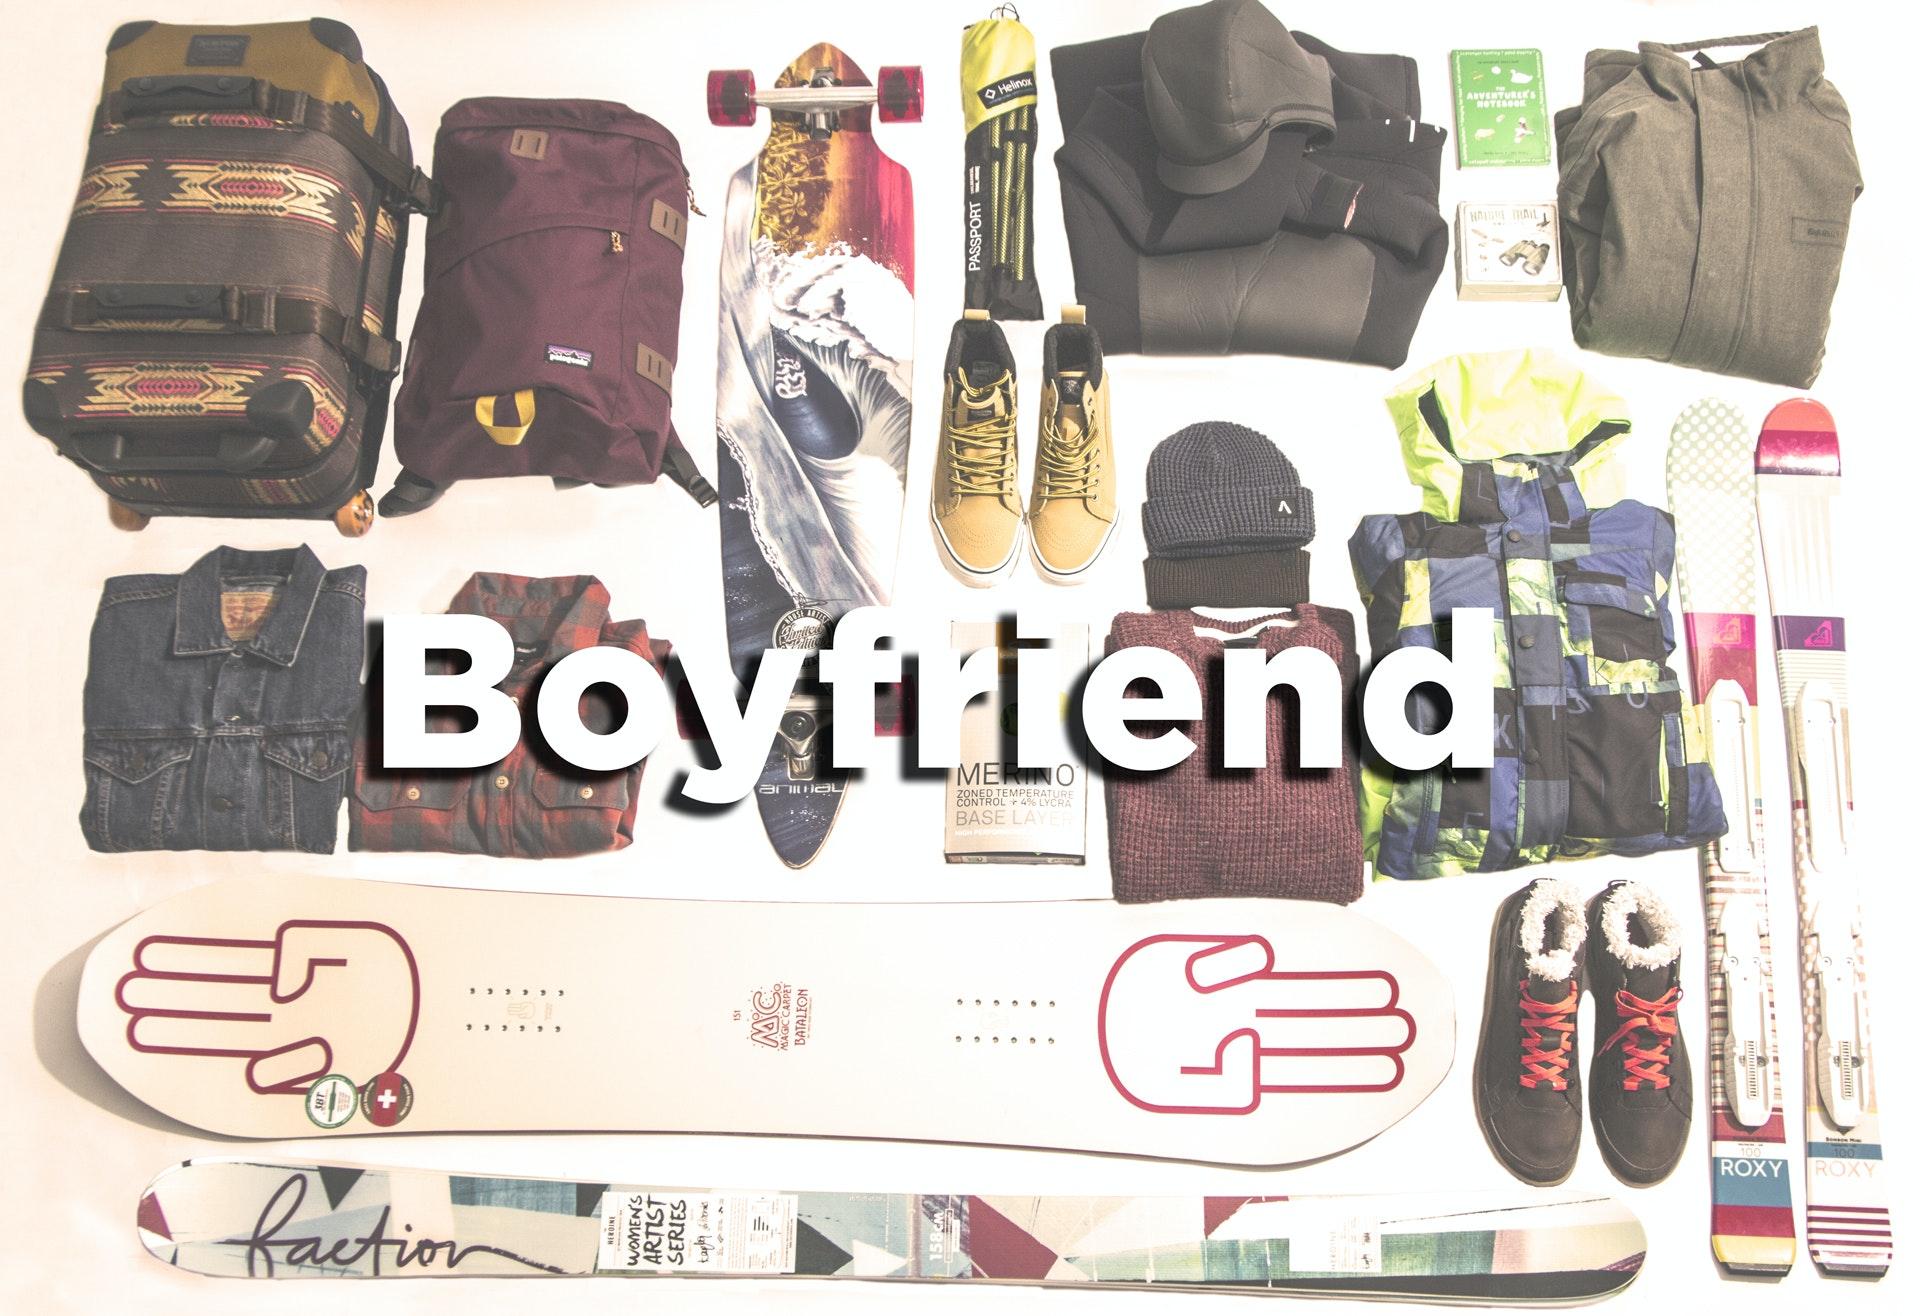 You are my boyfriend i am your girlfriend